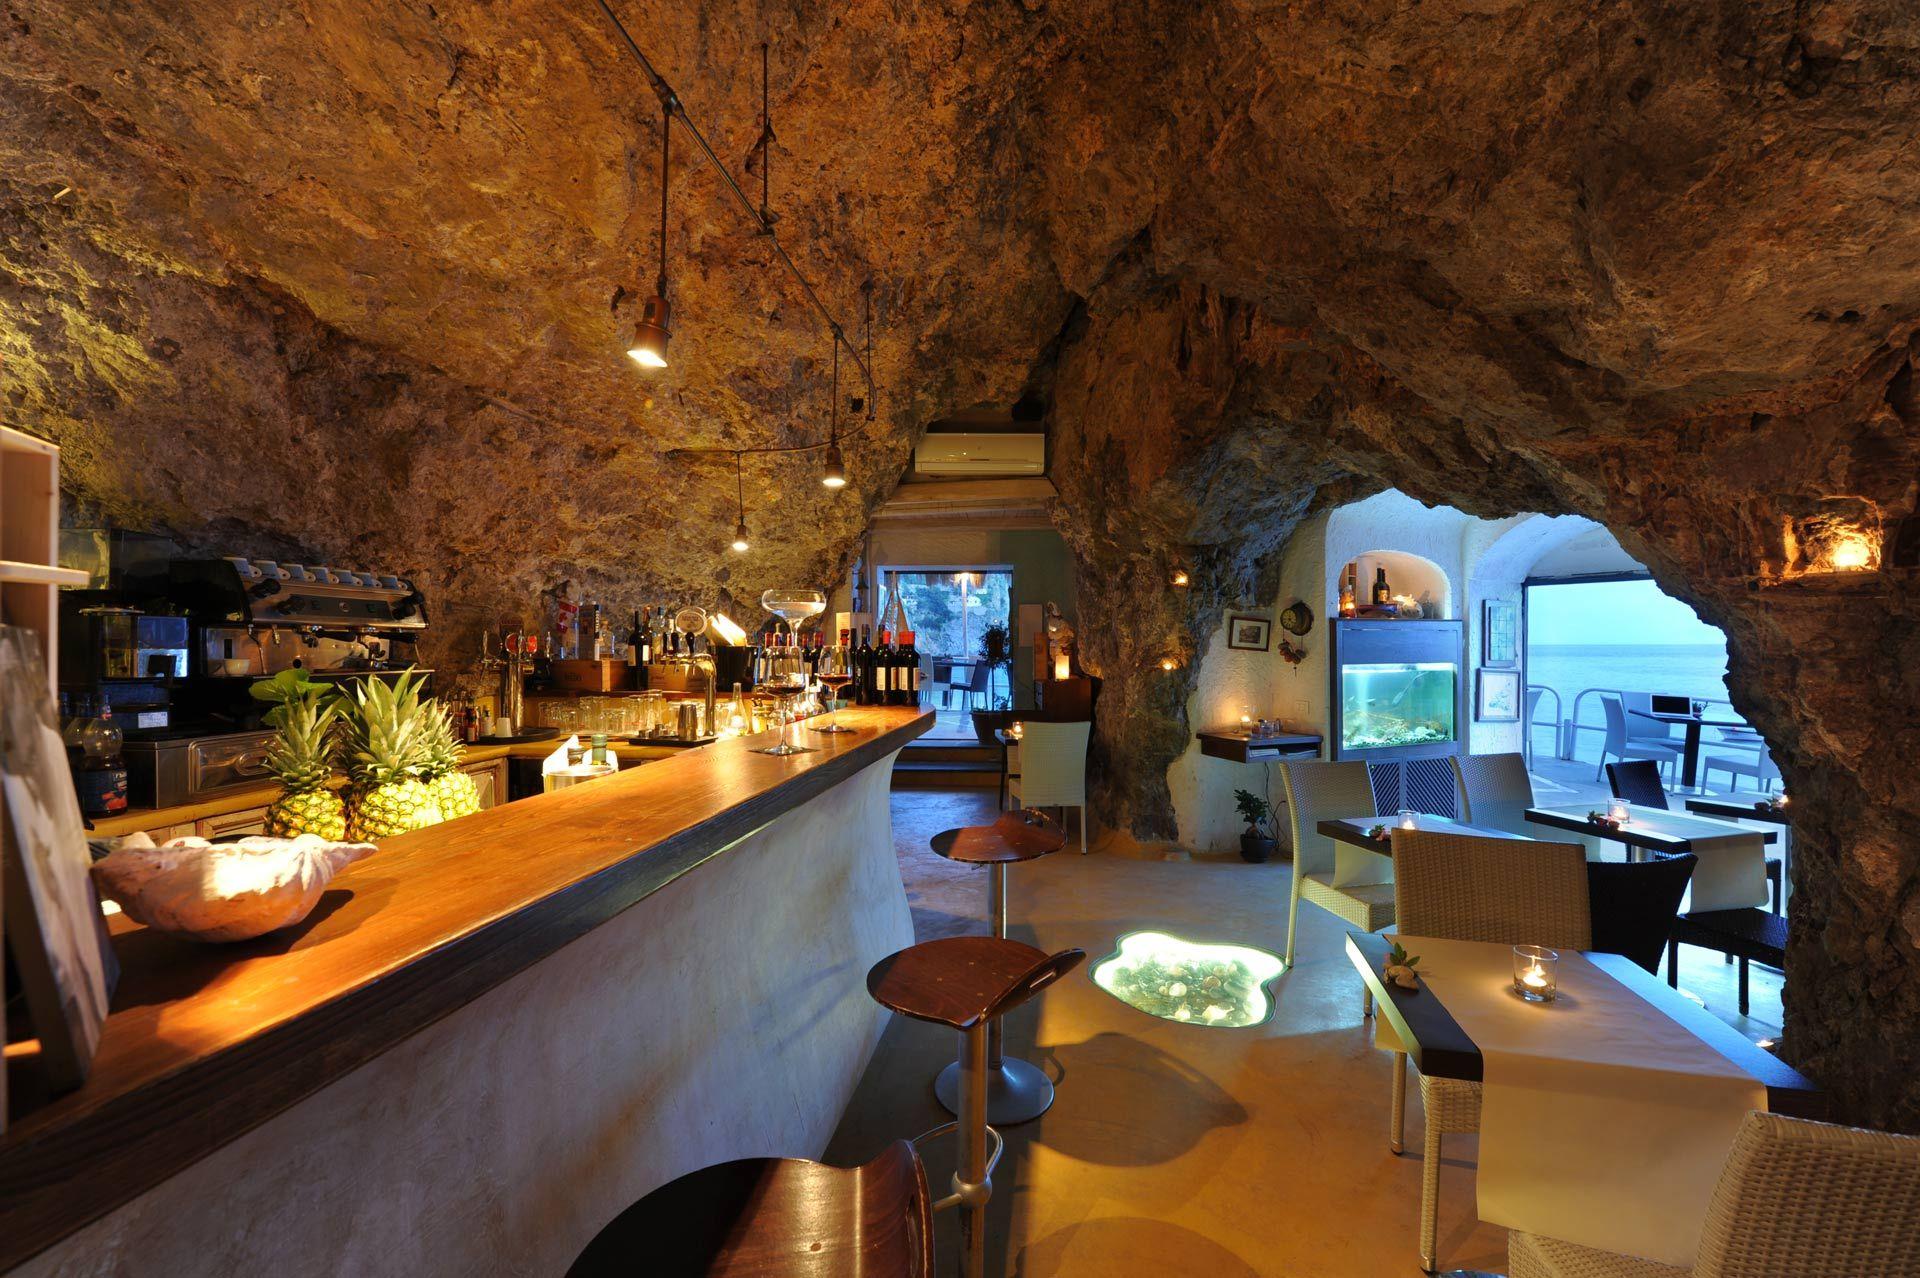 Il Pirata Restaurant Lounge Bar Seaview On Amalficoast Amalfi Coast Restaurants Amalfi Coast Amalfi Coast Italy